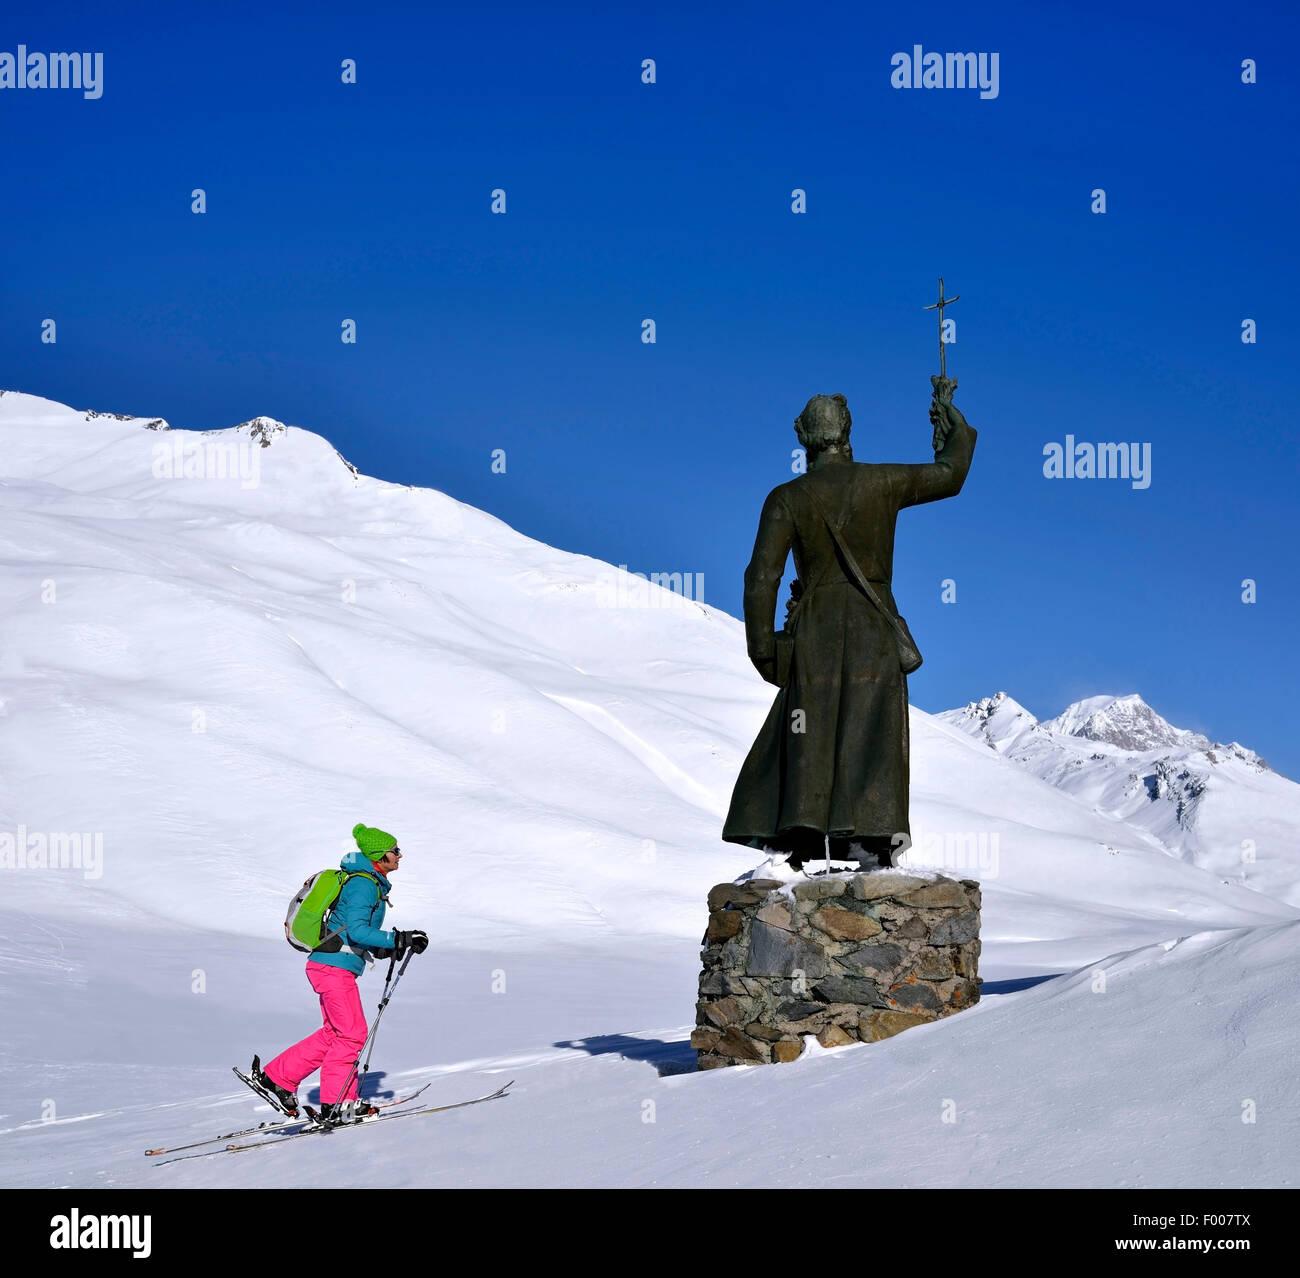 ski touring near the statue of Pierre Chanoux at Little St Bernard Pass, France, Savoie - Stock Image